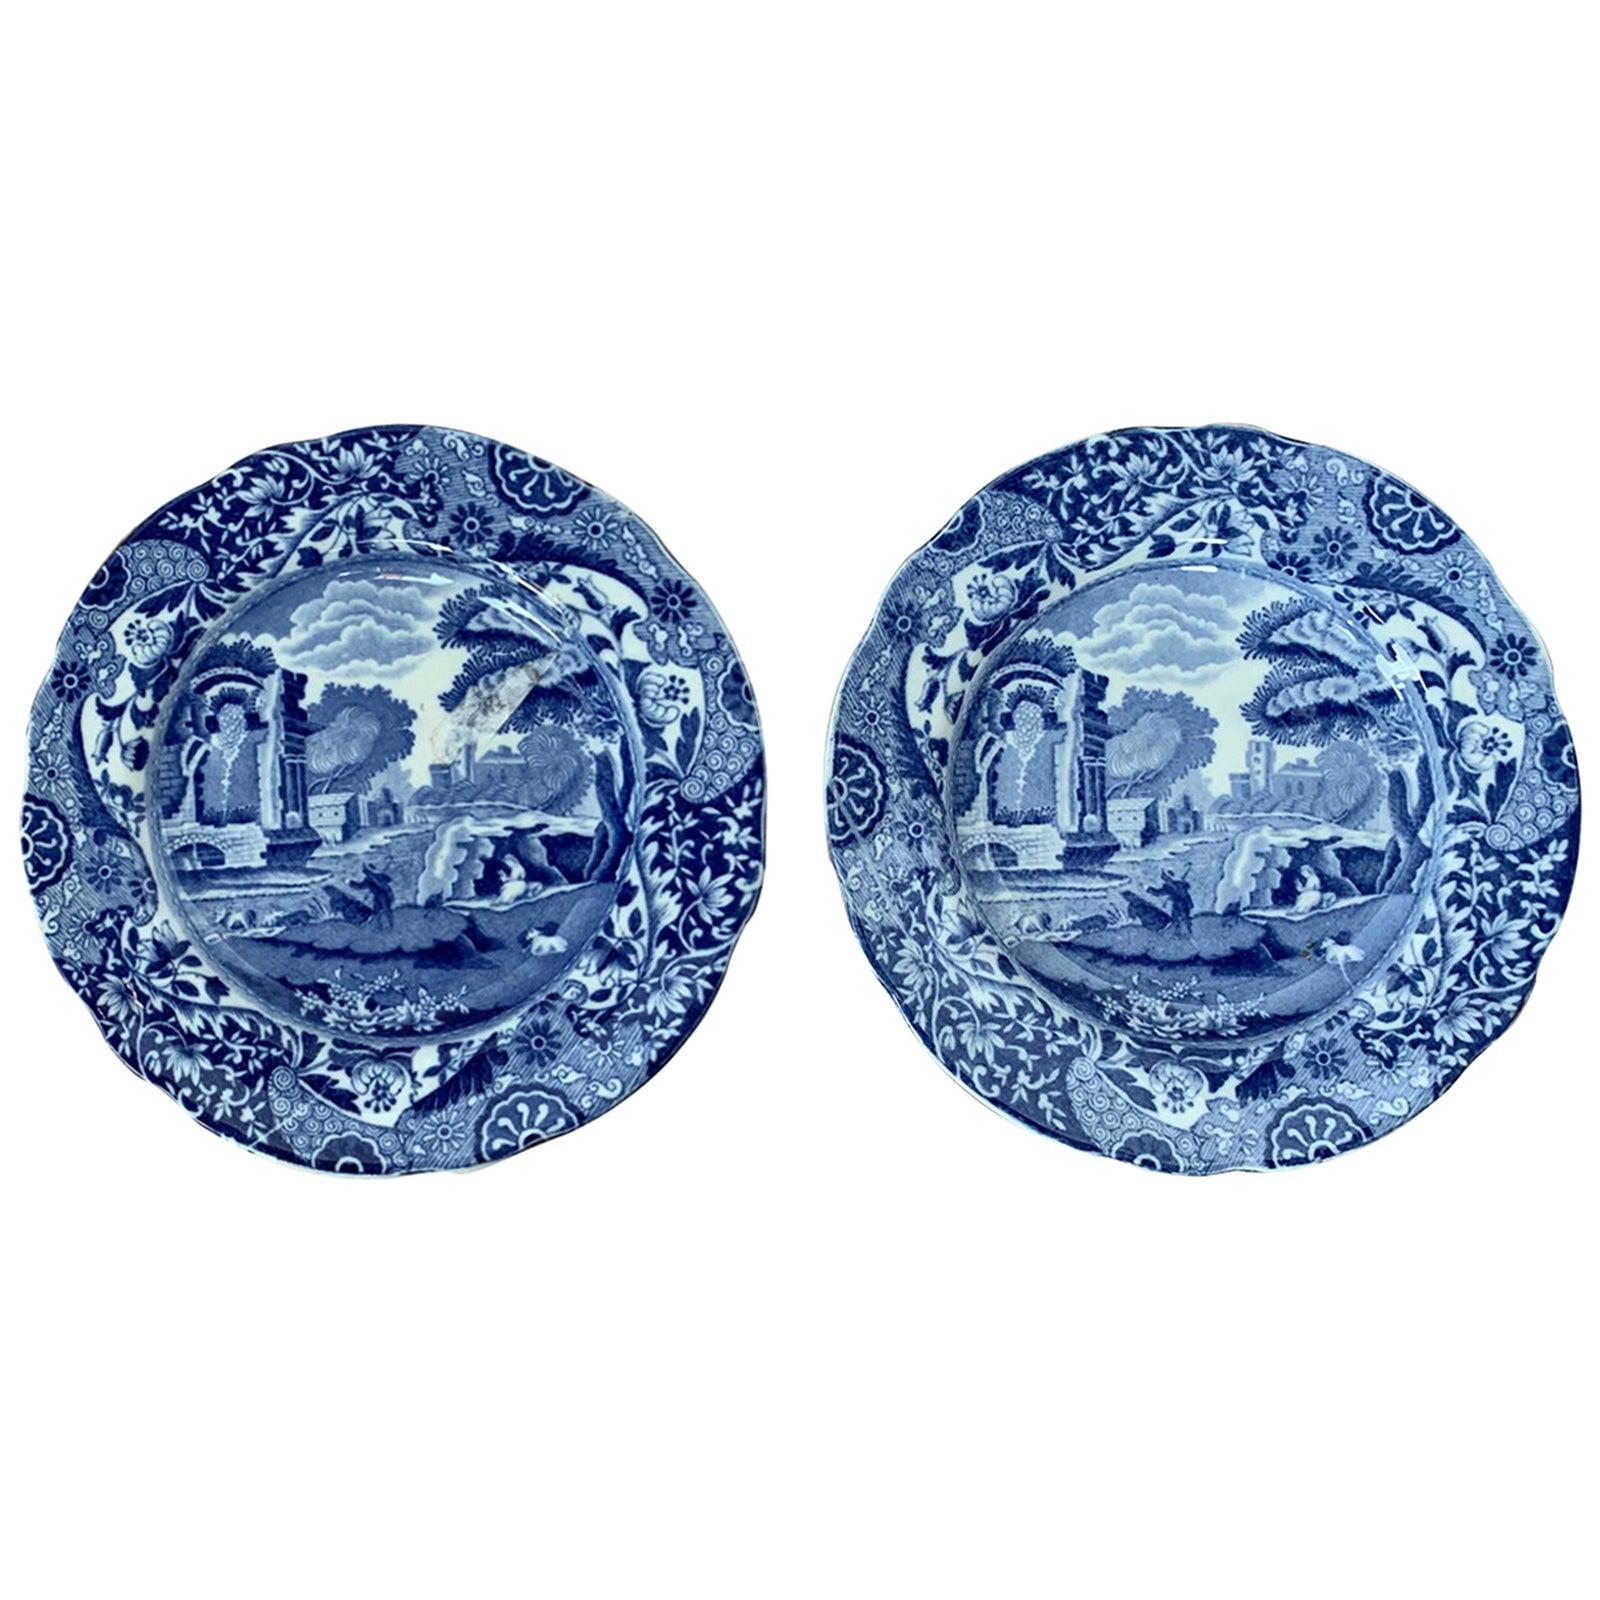 Pair of 19th Century English Blue & White Copeland Spode Round Porcelain Plates